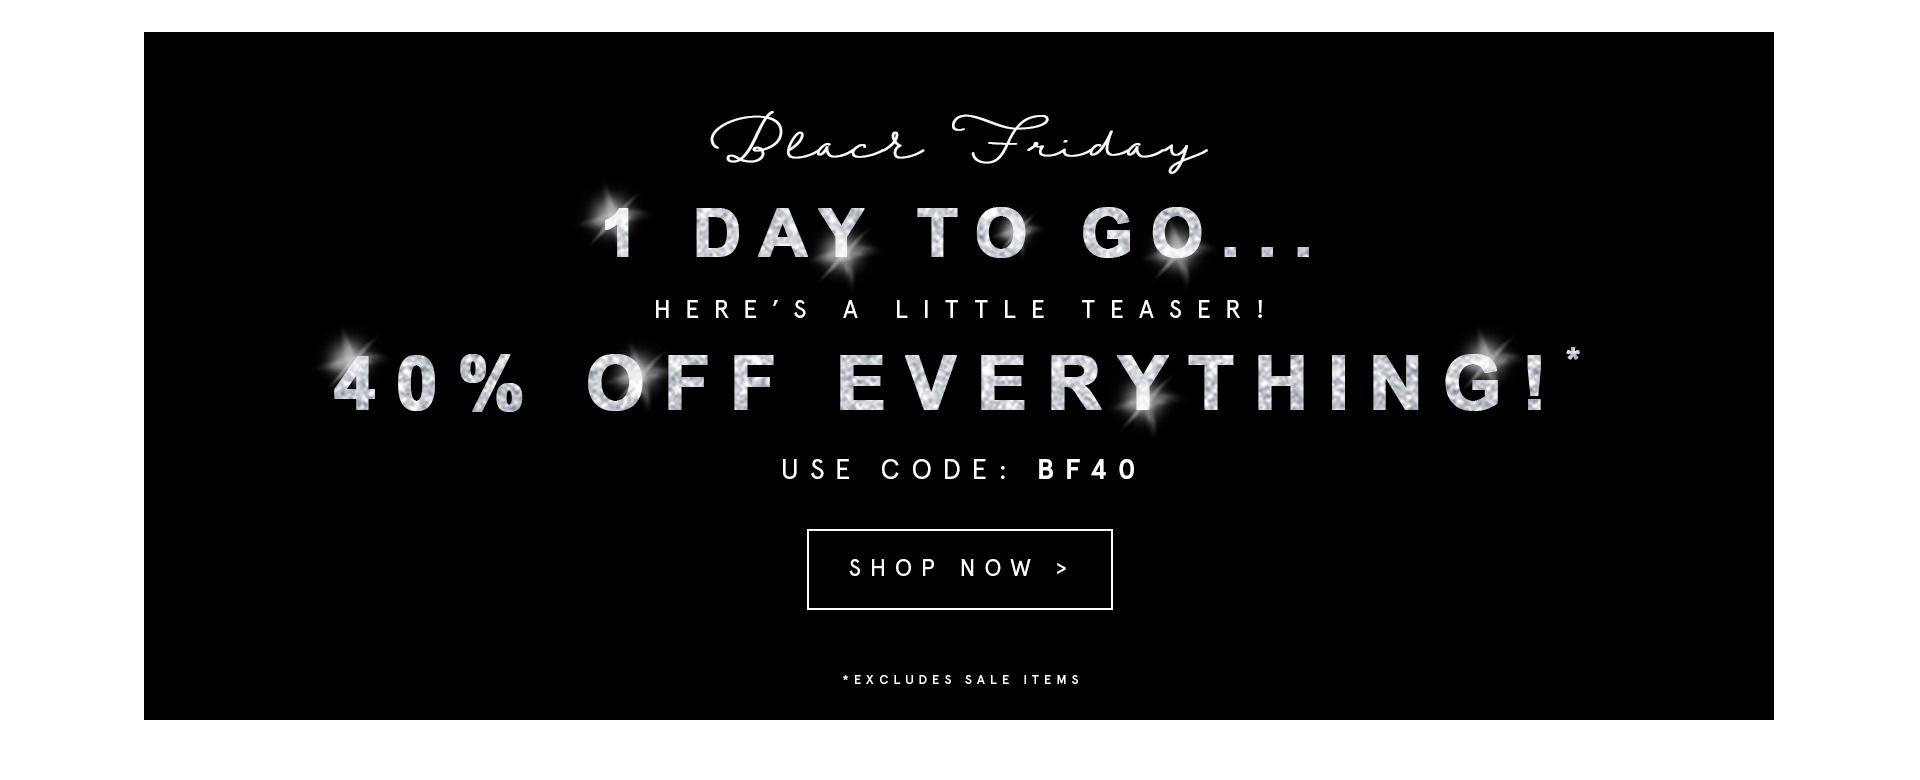 Black Friday Brand Attic: 40% off everything